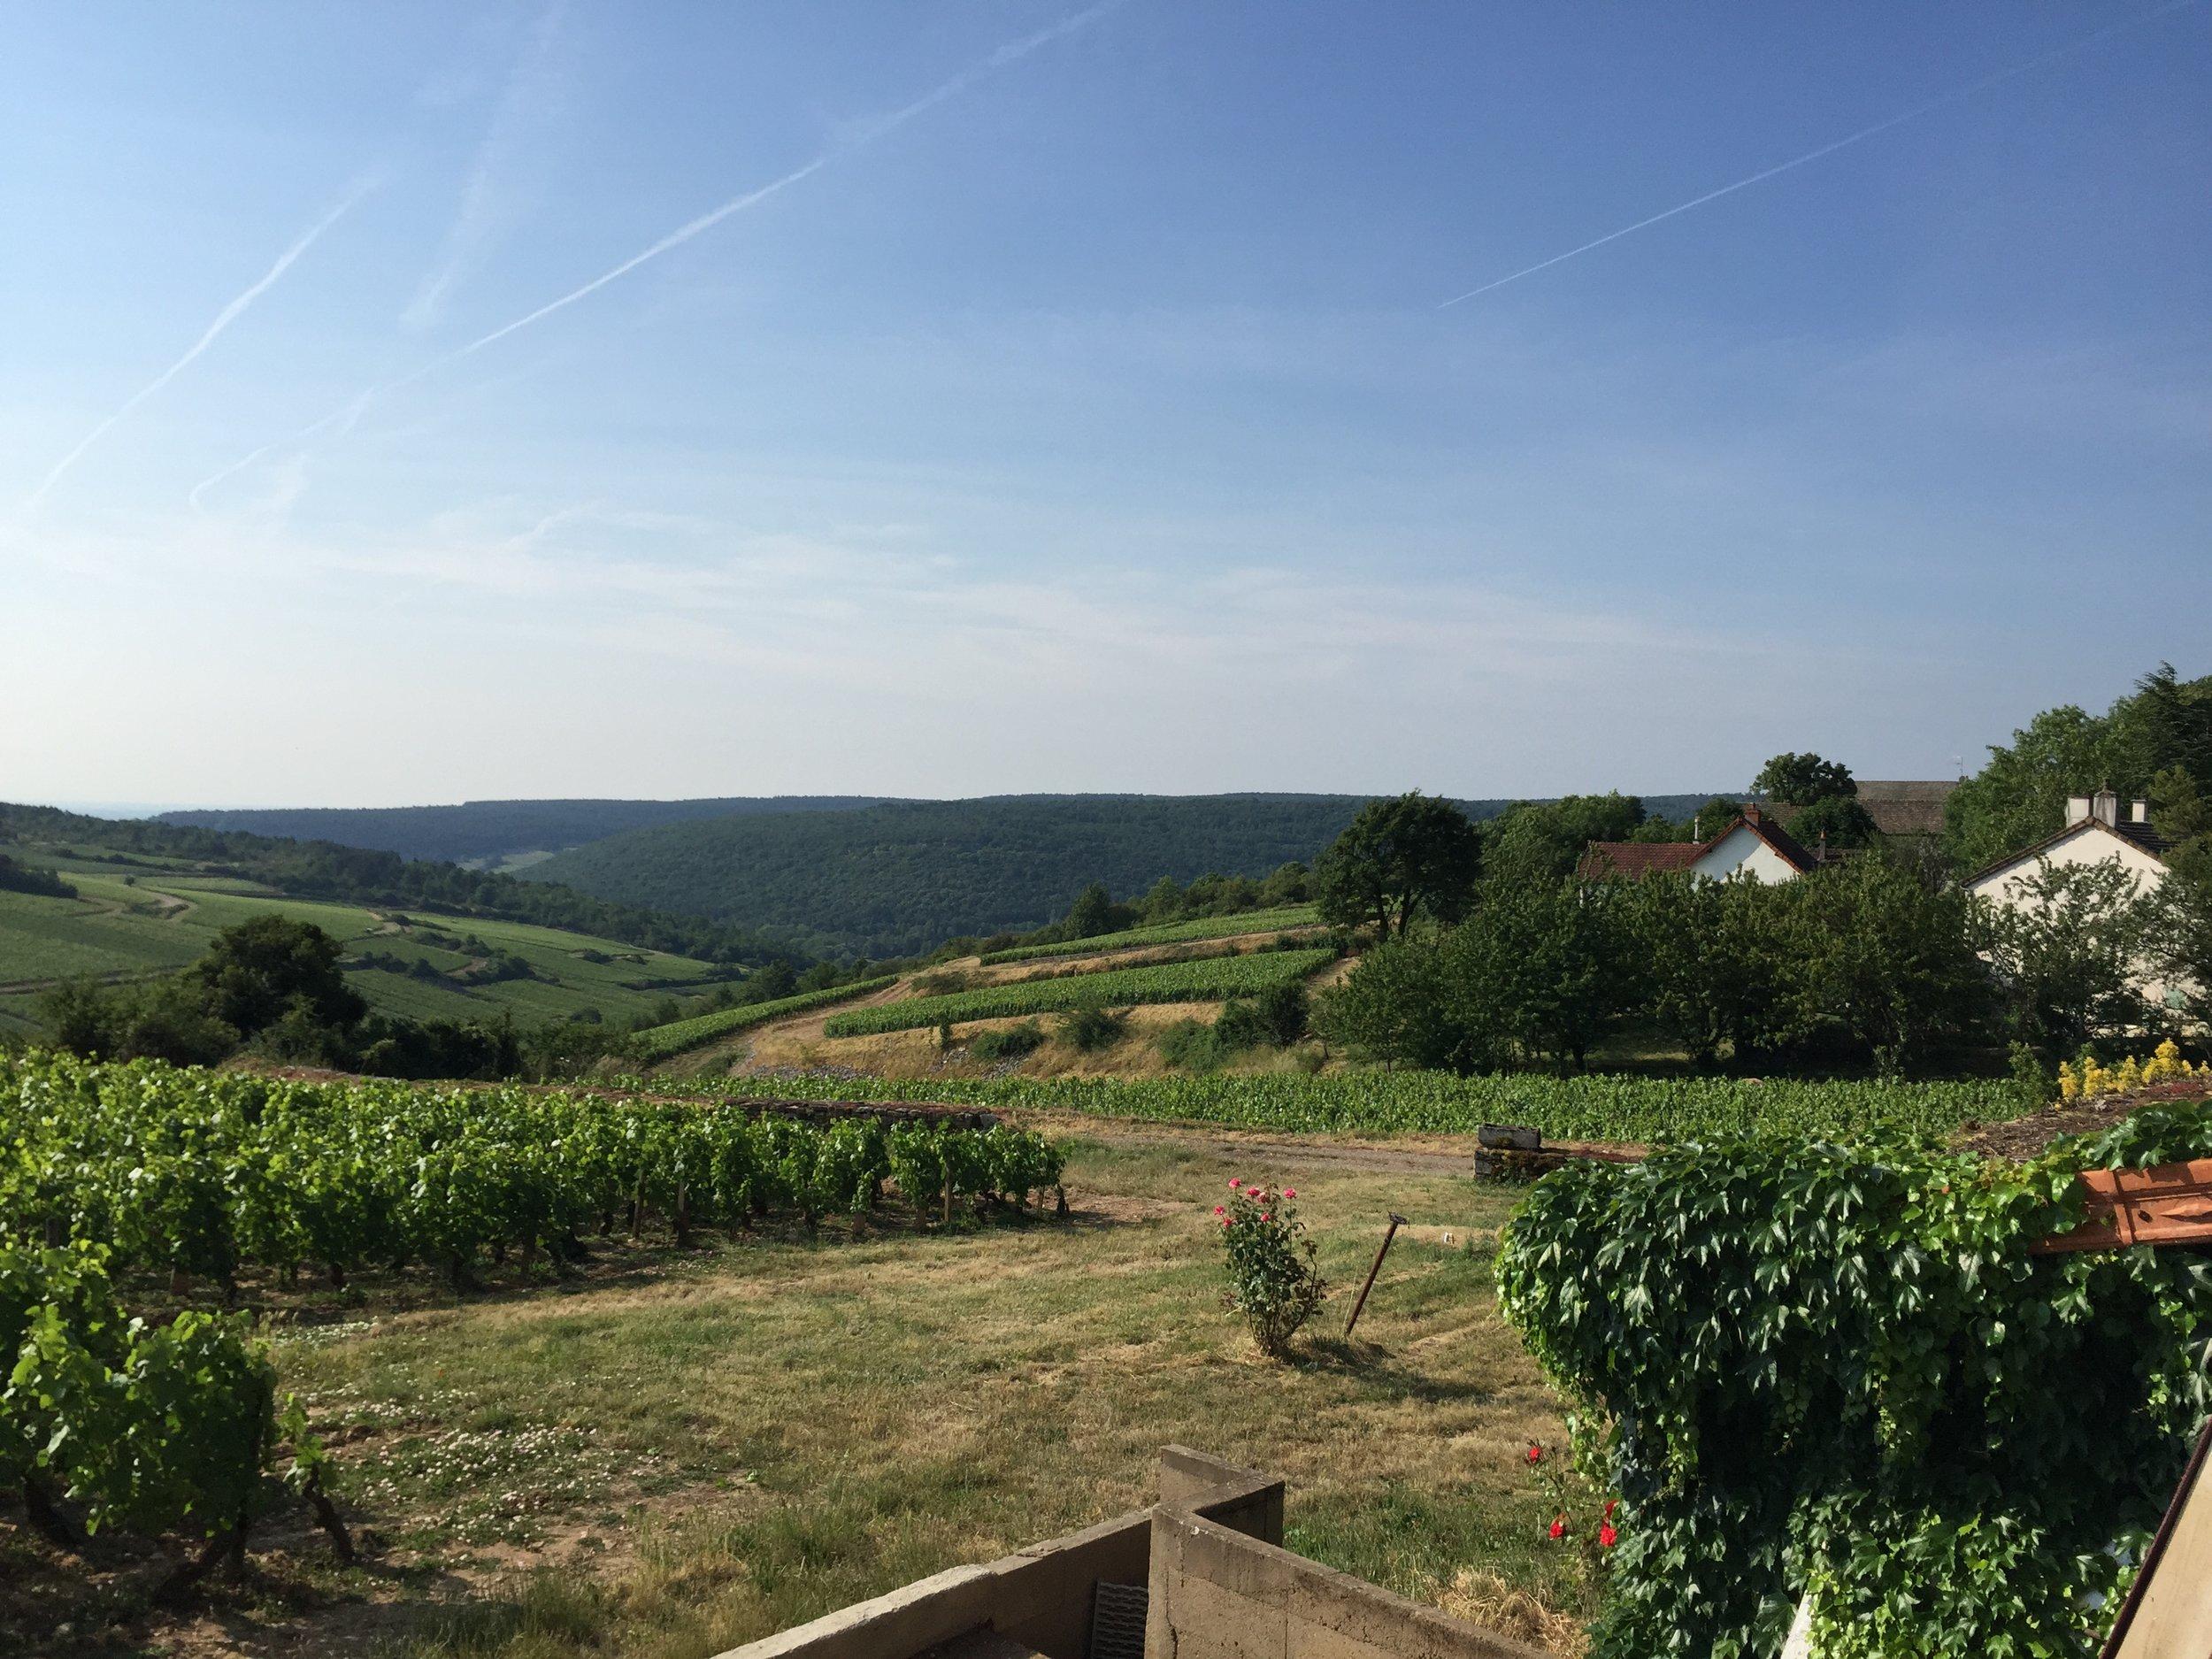 Decanter: Top value white Burgundy 2016 wines (ft. Domaine Louis Michel & Fils, Domaine Alain Gras) | 1/4/18